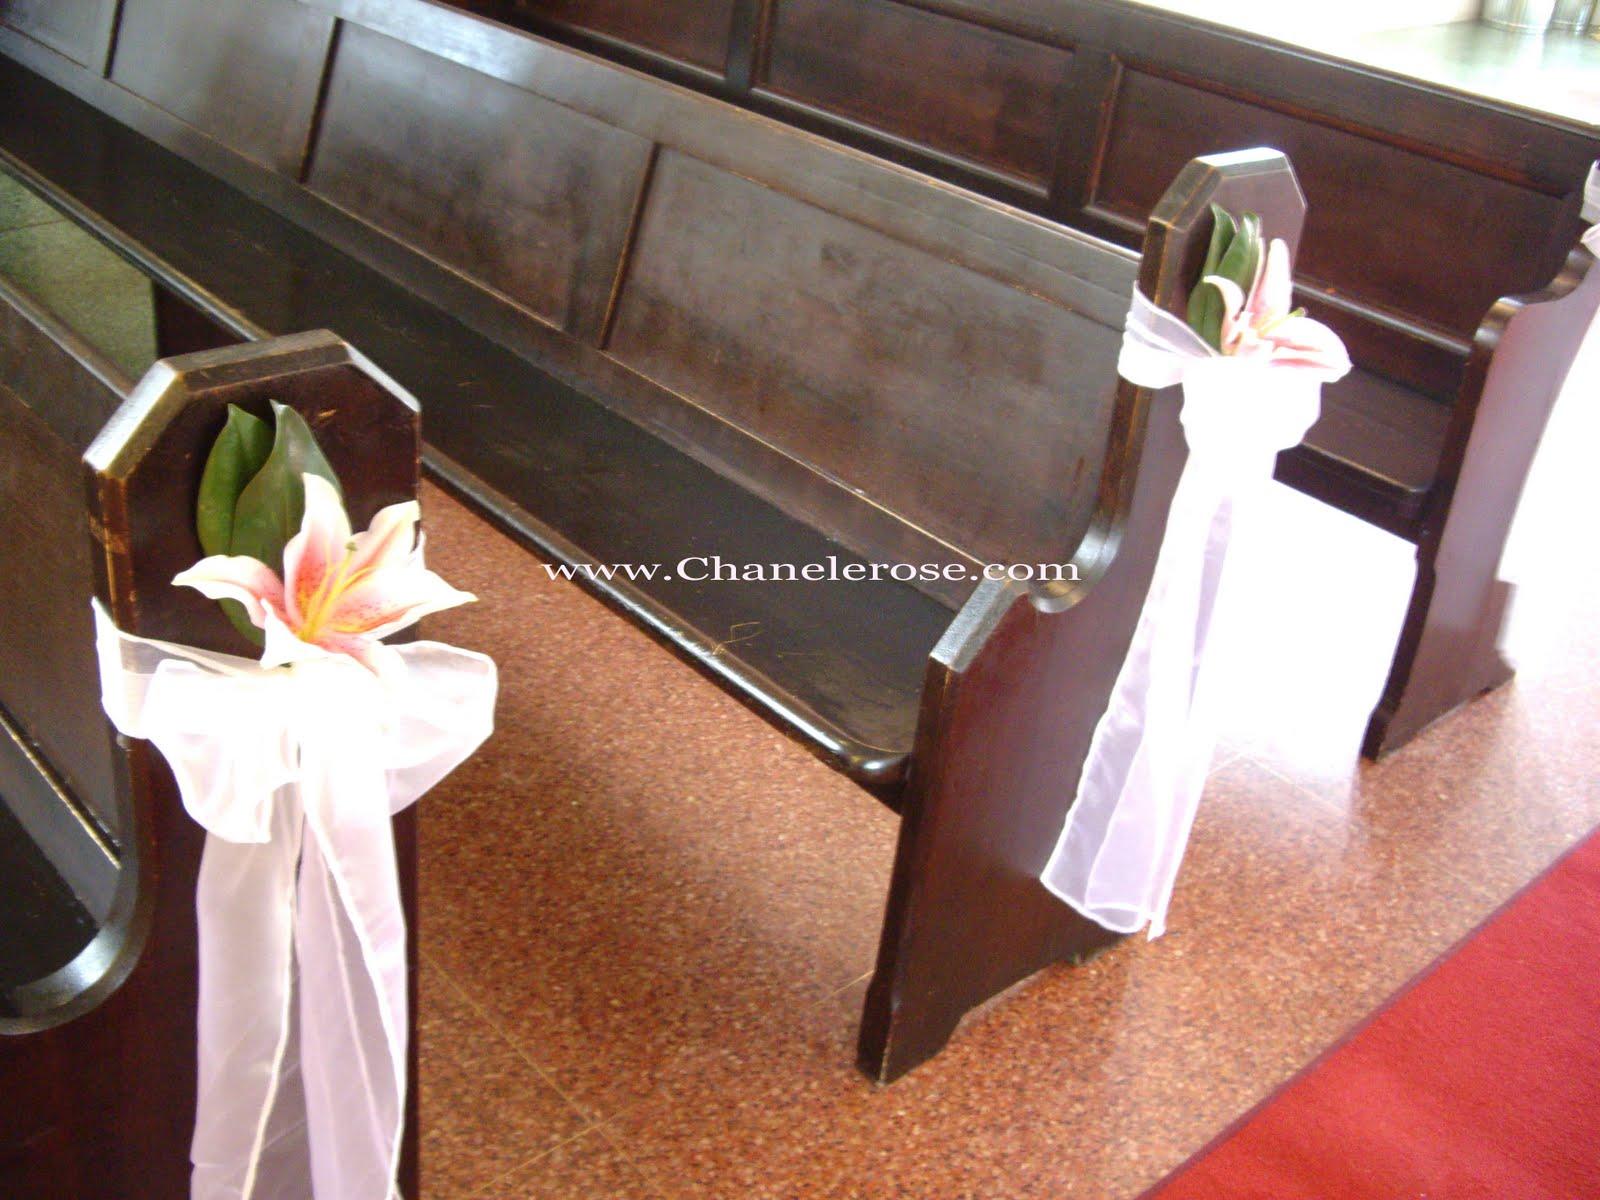 wedding flowers on church pews wedding flowers 2013. Black Bedroom Furniture Sets. Home Design Ideas